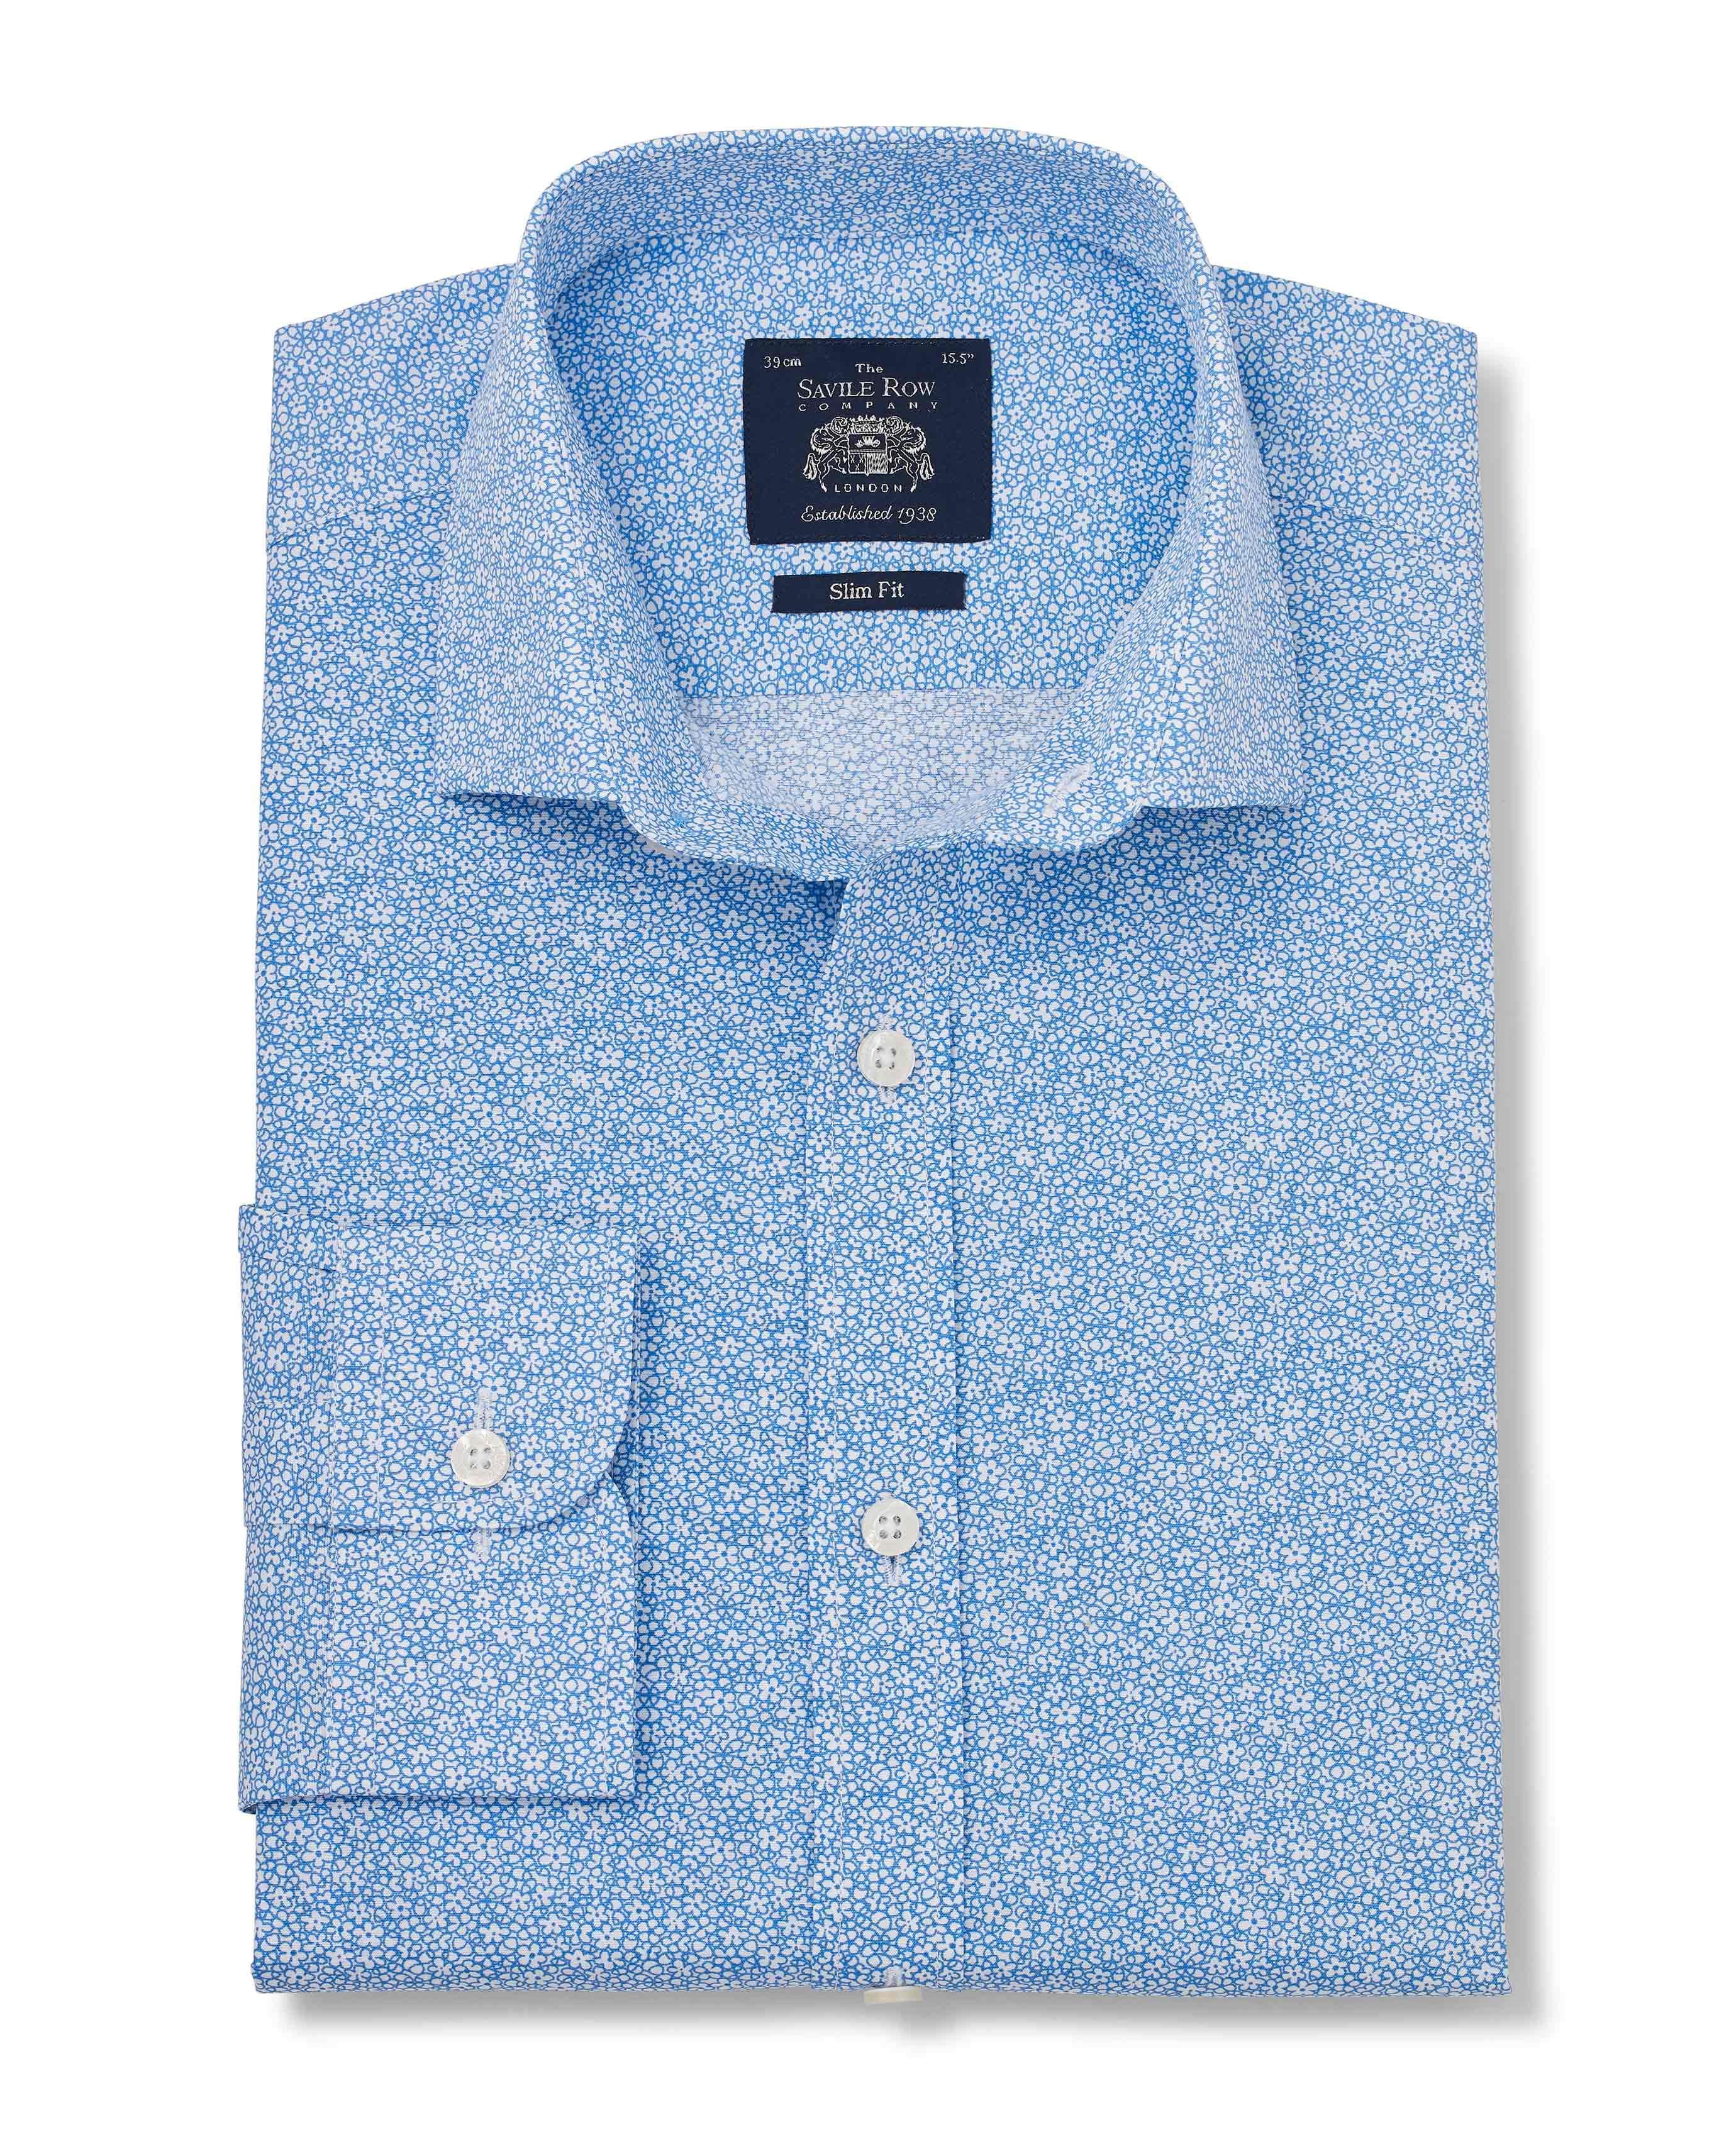 Savile-Row-Men-039-s-White-Blue-Floral-Print-Slim-Fit-Shirt-Single-Cuff